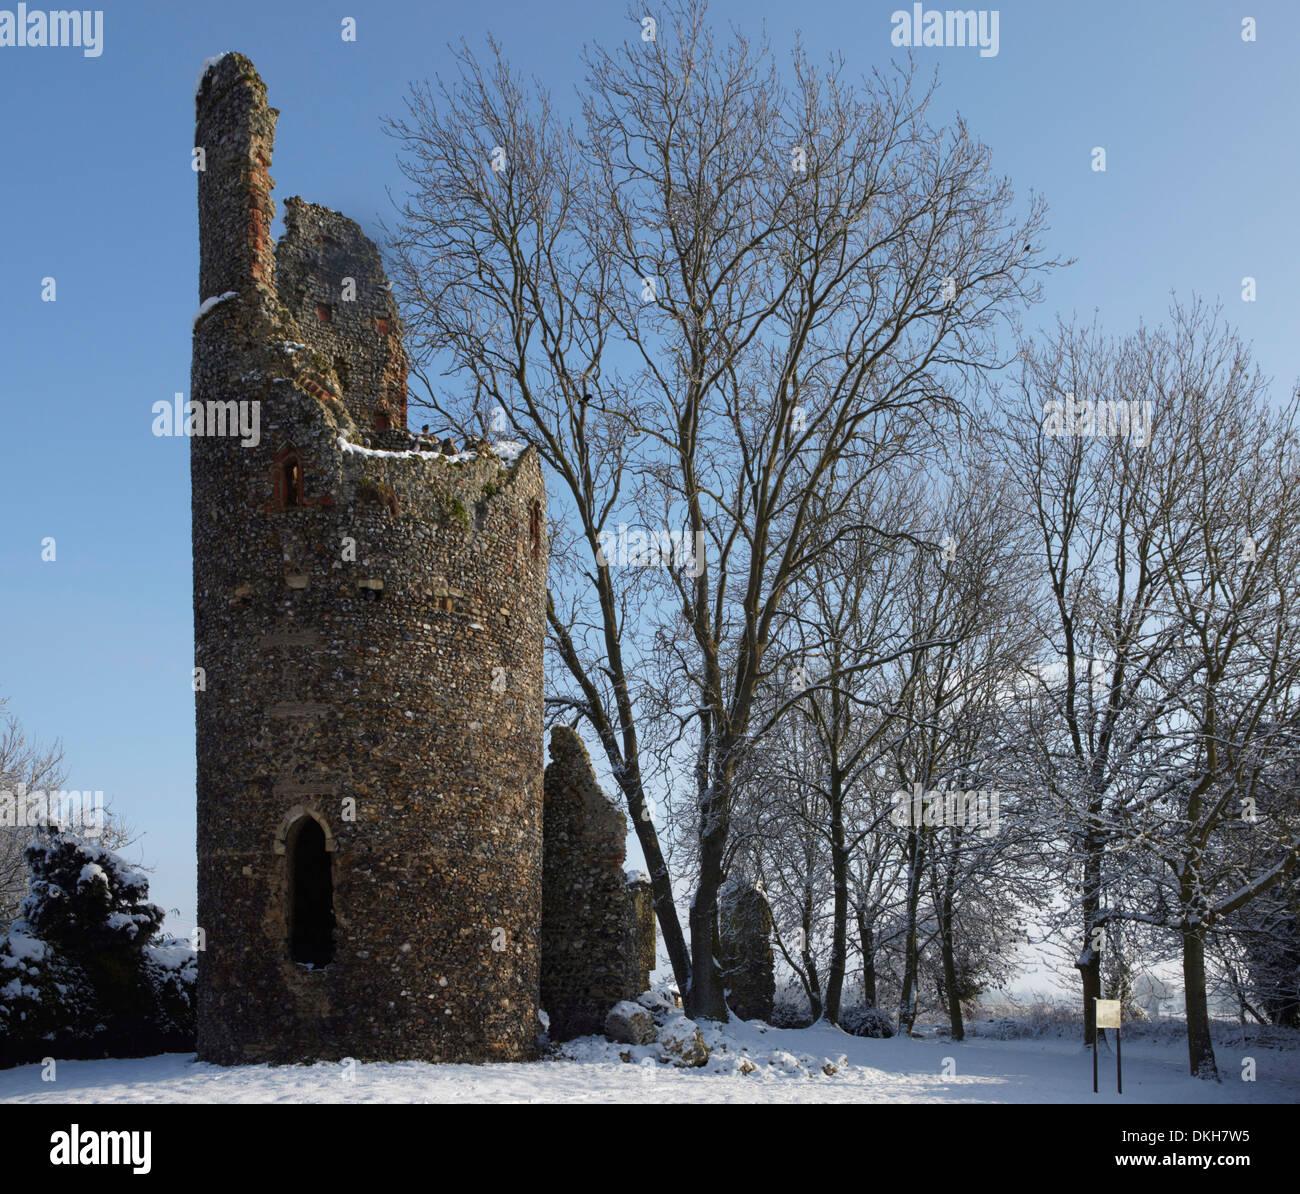 Kirby Bedon, Norwich, Norfolk, England, United Kingdom, Europe - Stock Image